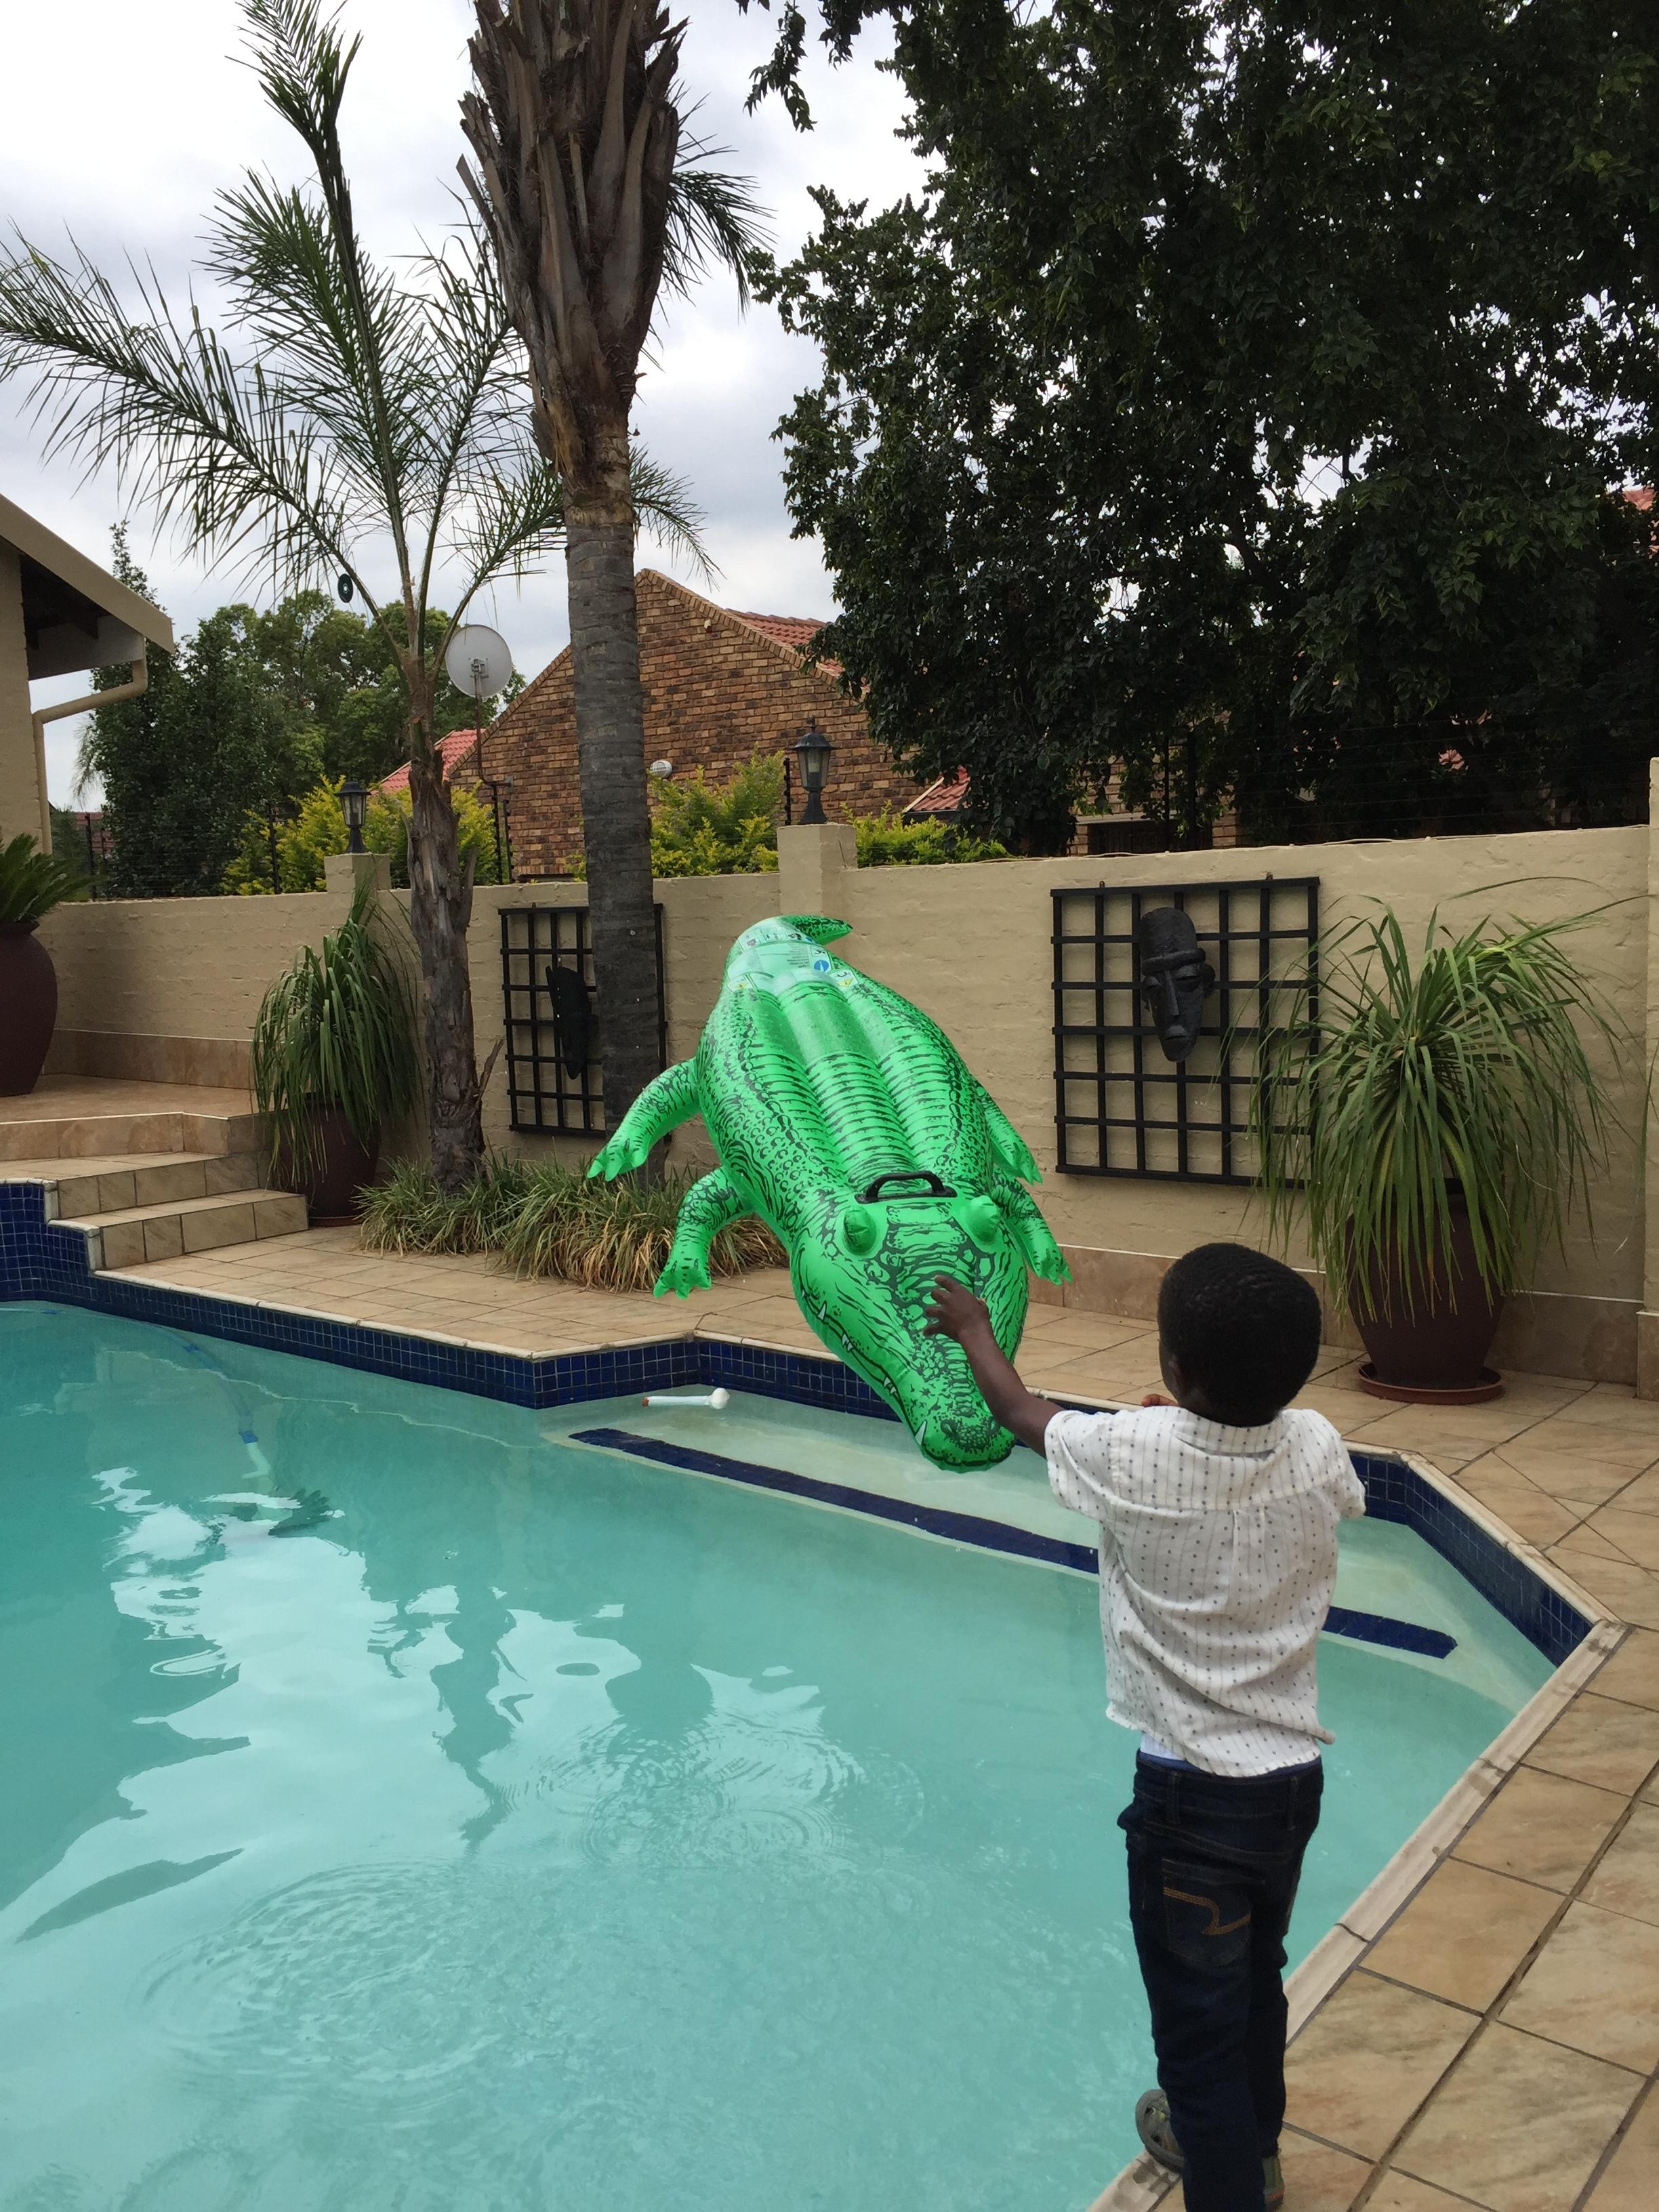 Throwing the crocodile.